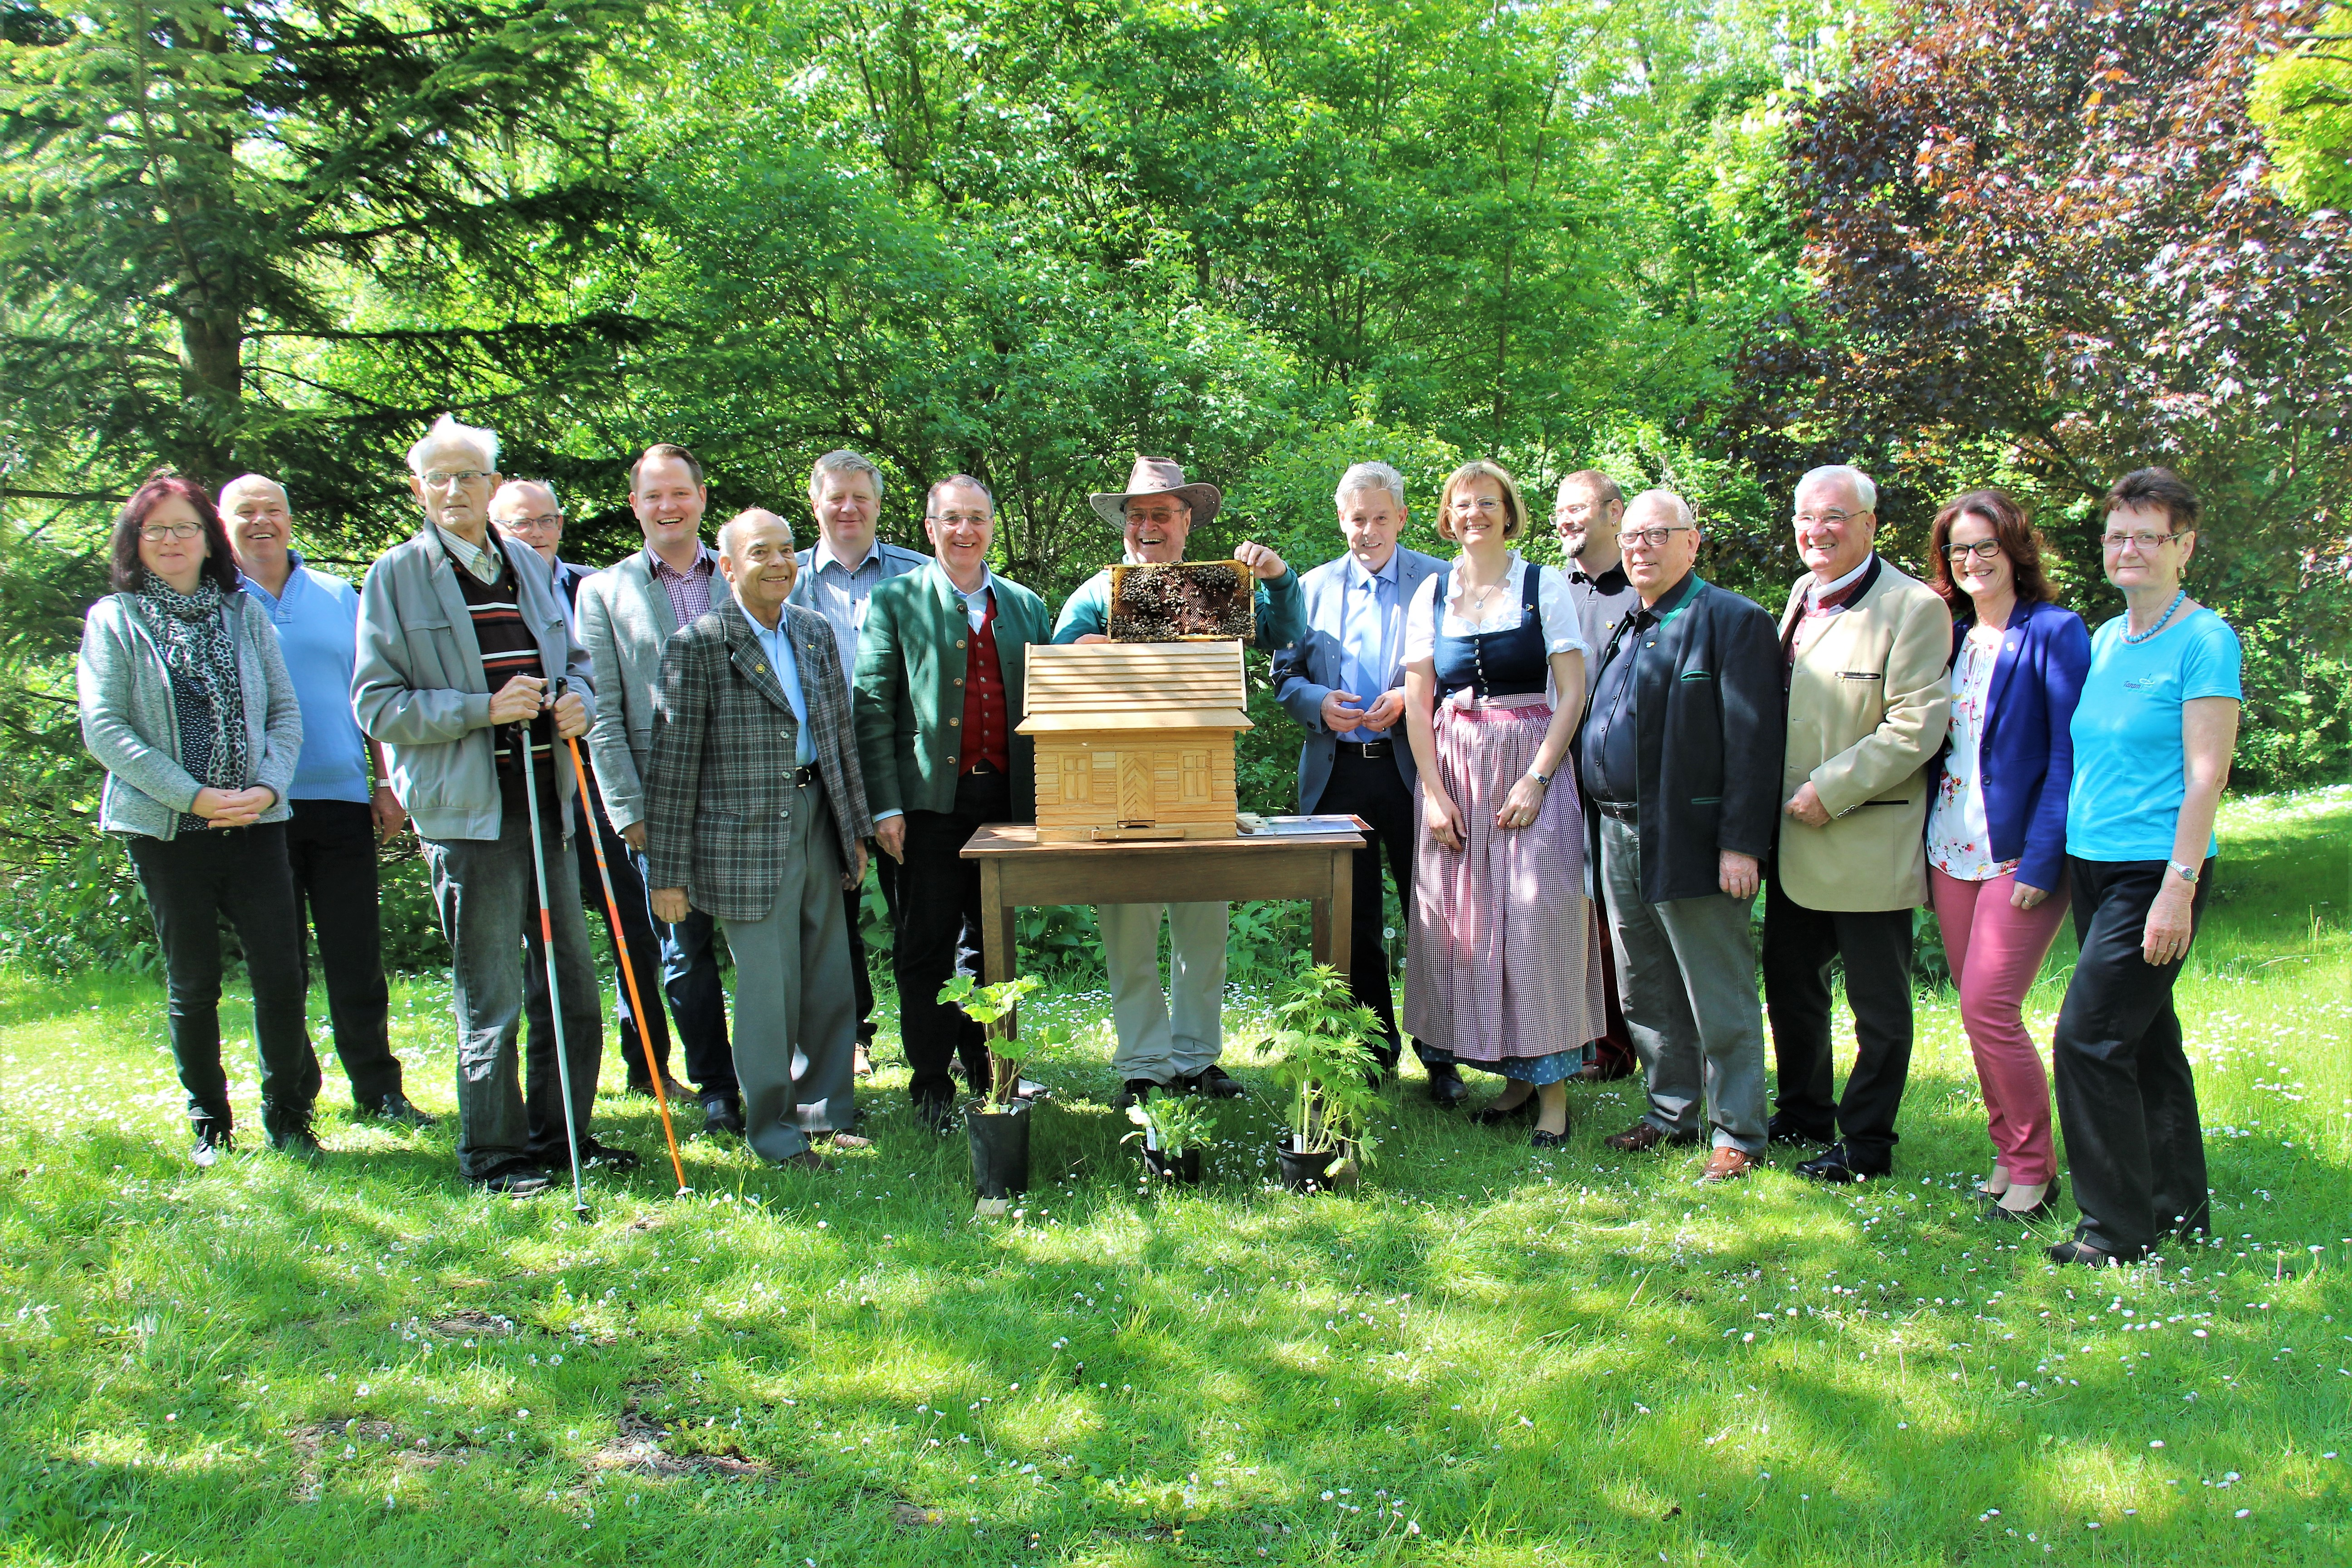 Imkerverband und Kneipp-Aktiv-Club feierten in Ternitz